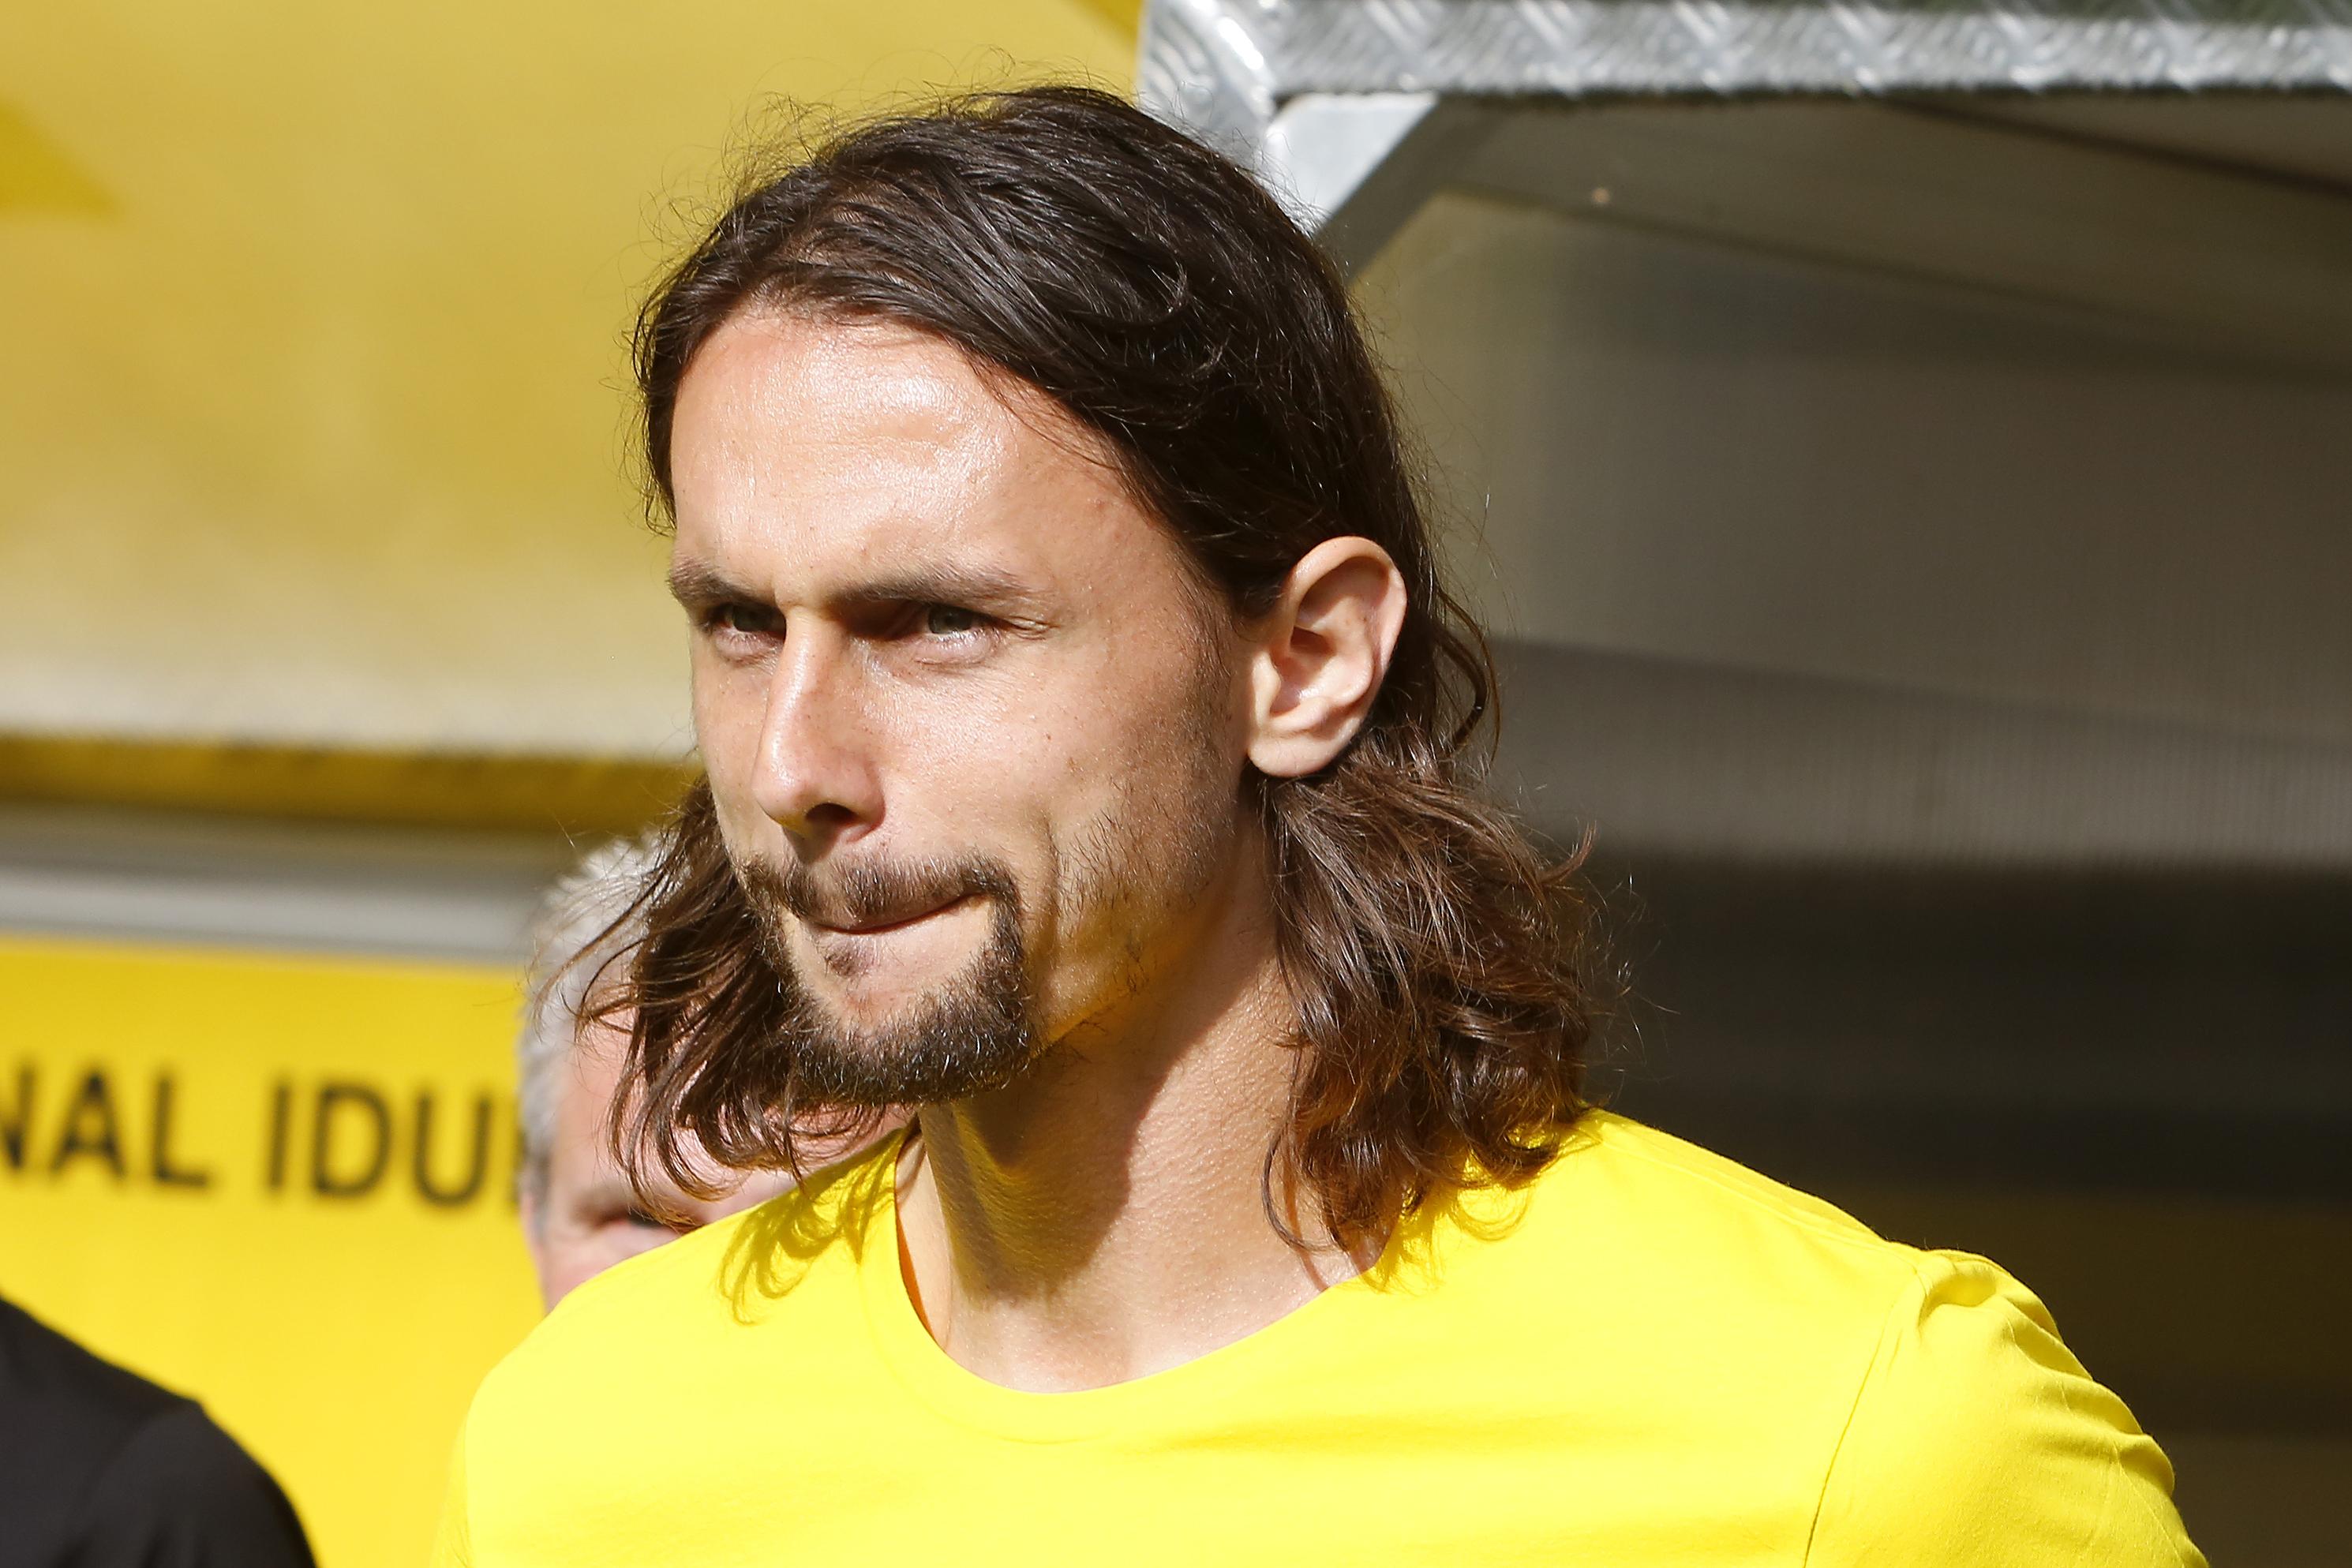 Neven Subotić  - 2018 Regular brown hair & alternative hair style.